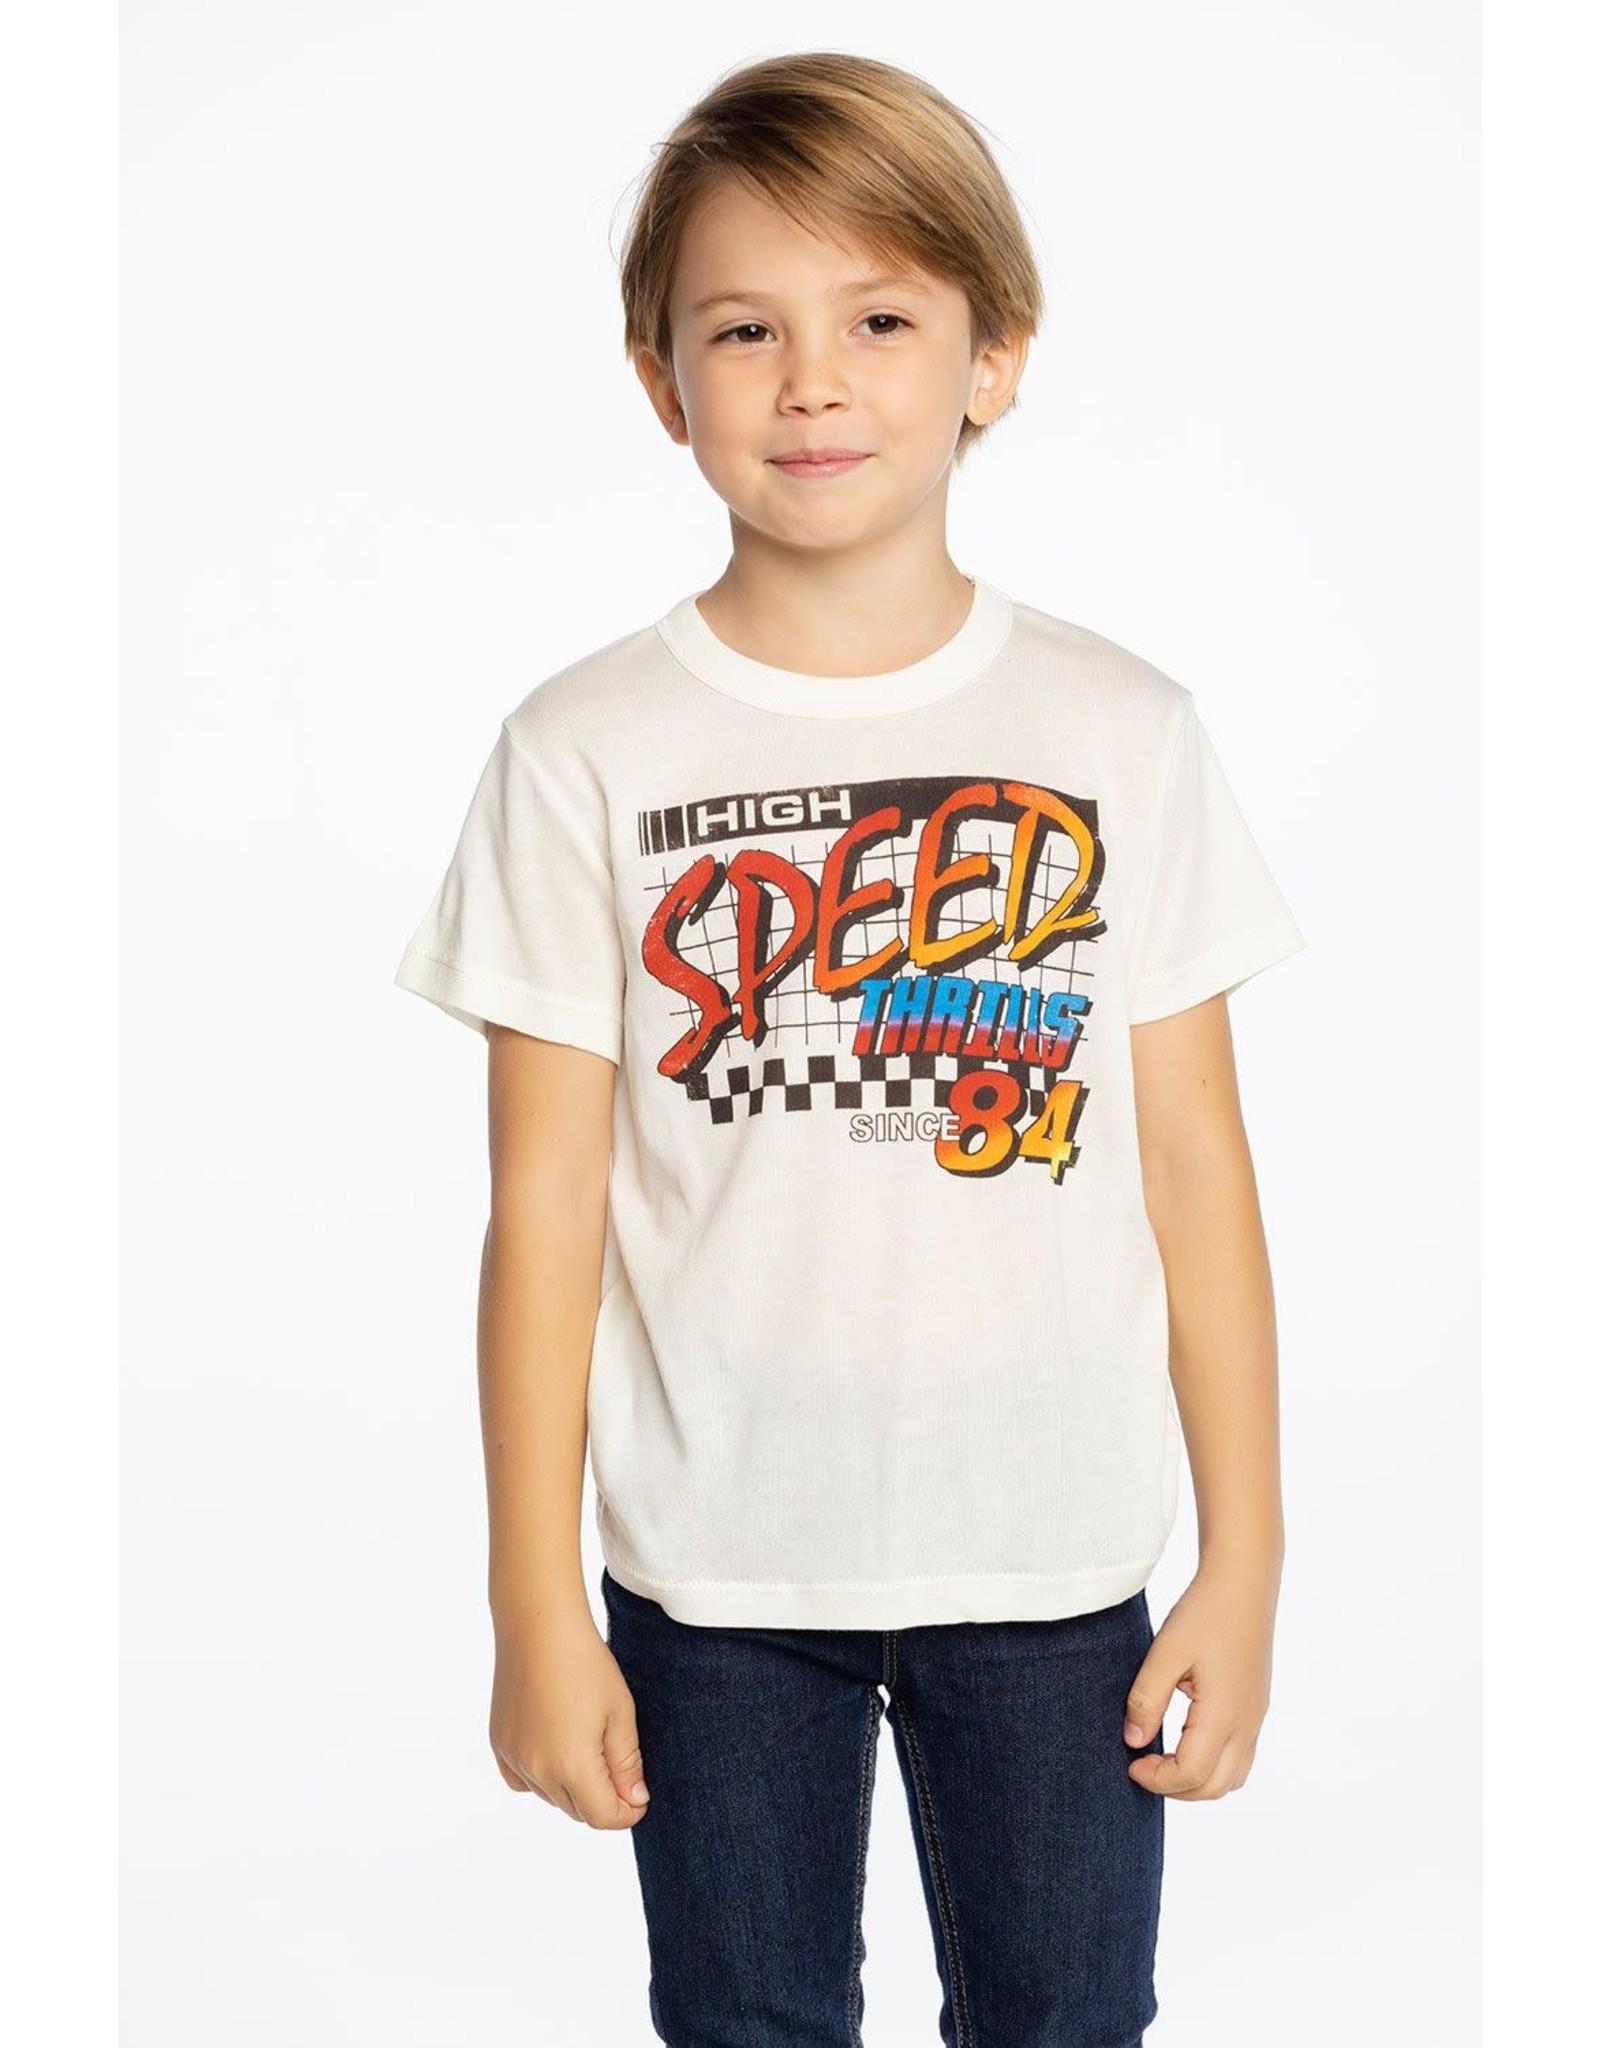 Chaser Chaser High Speed Thrills Tee